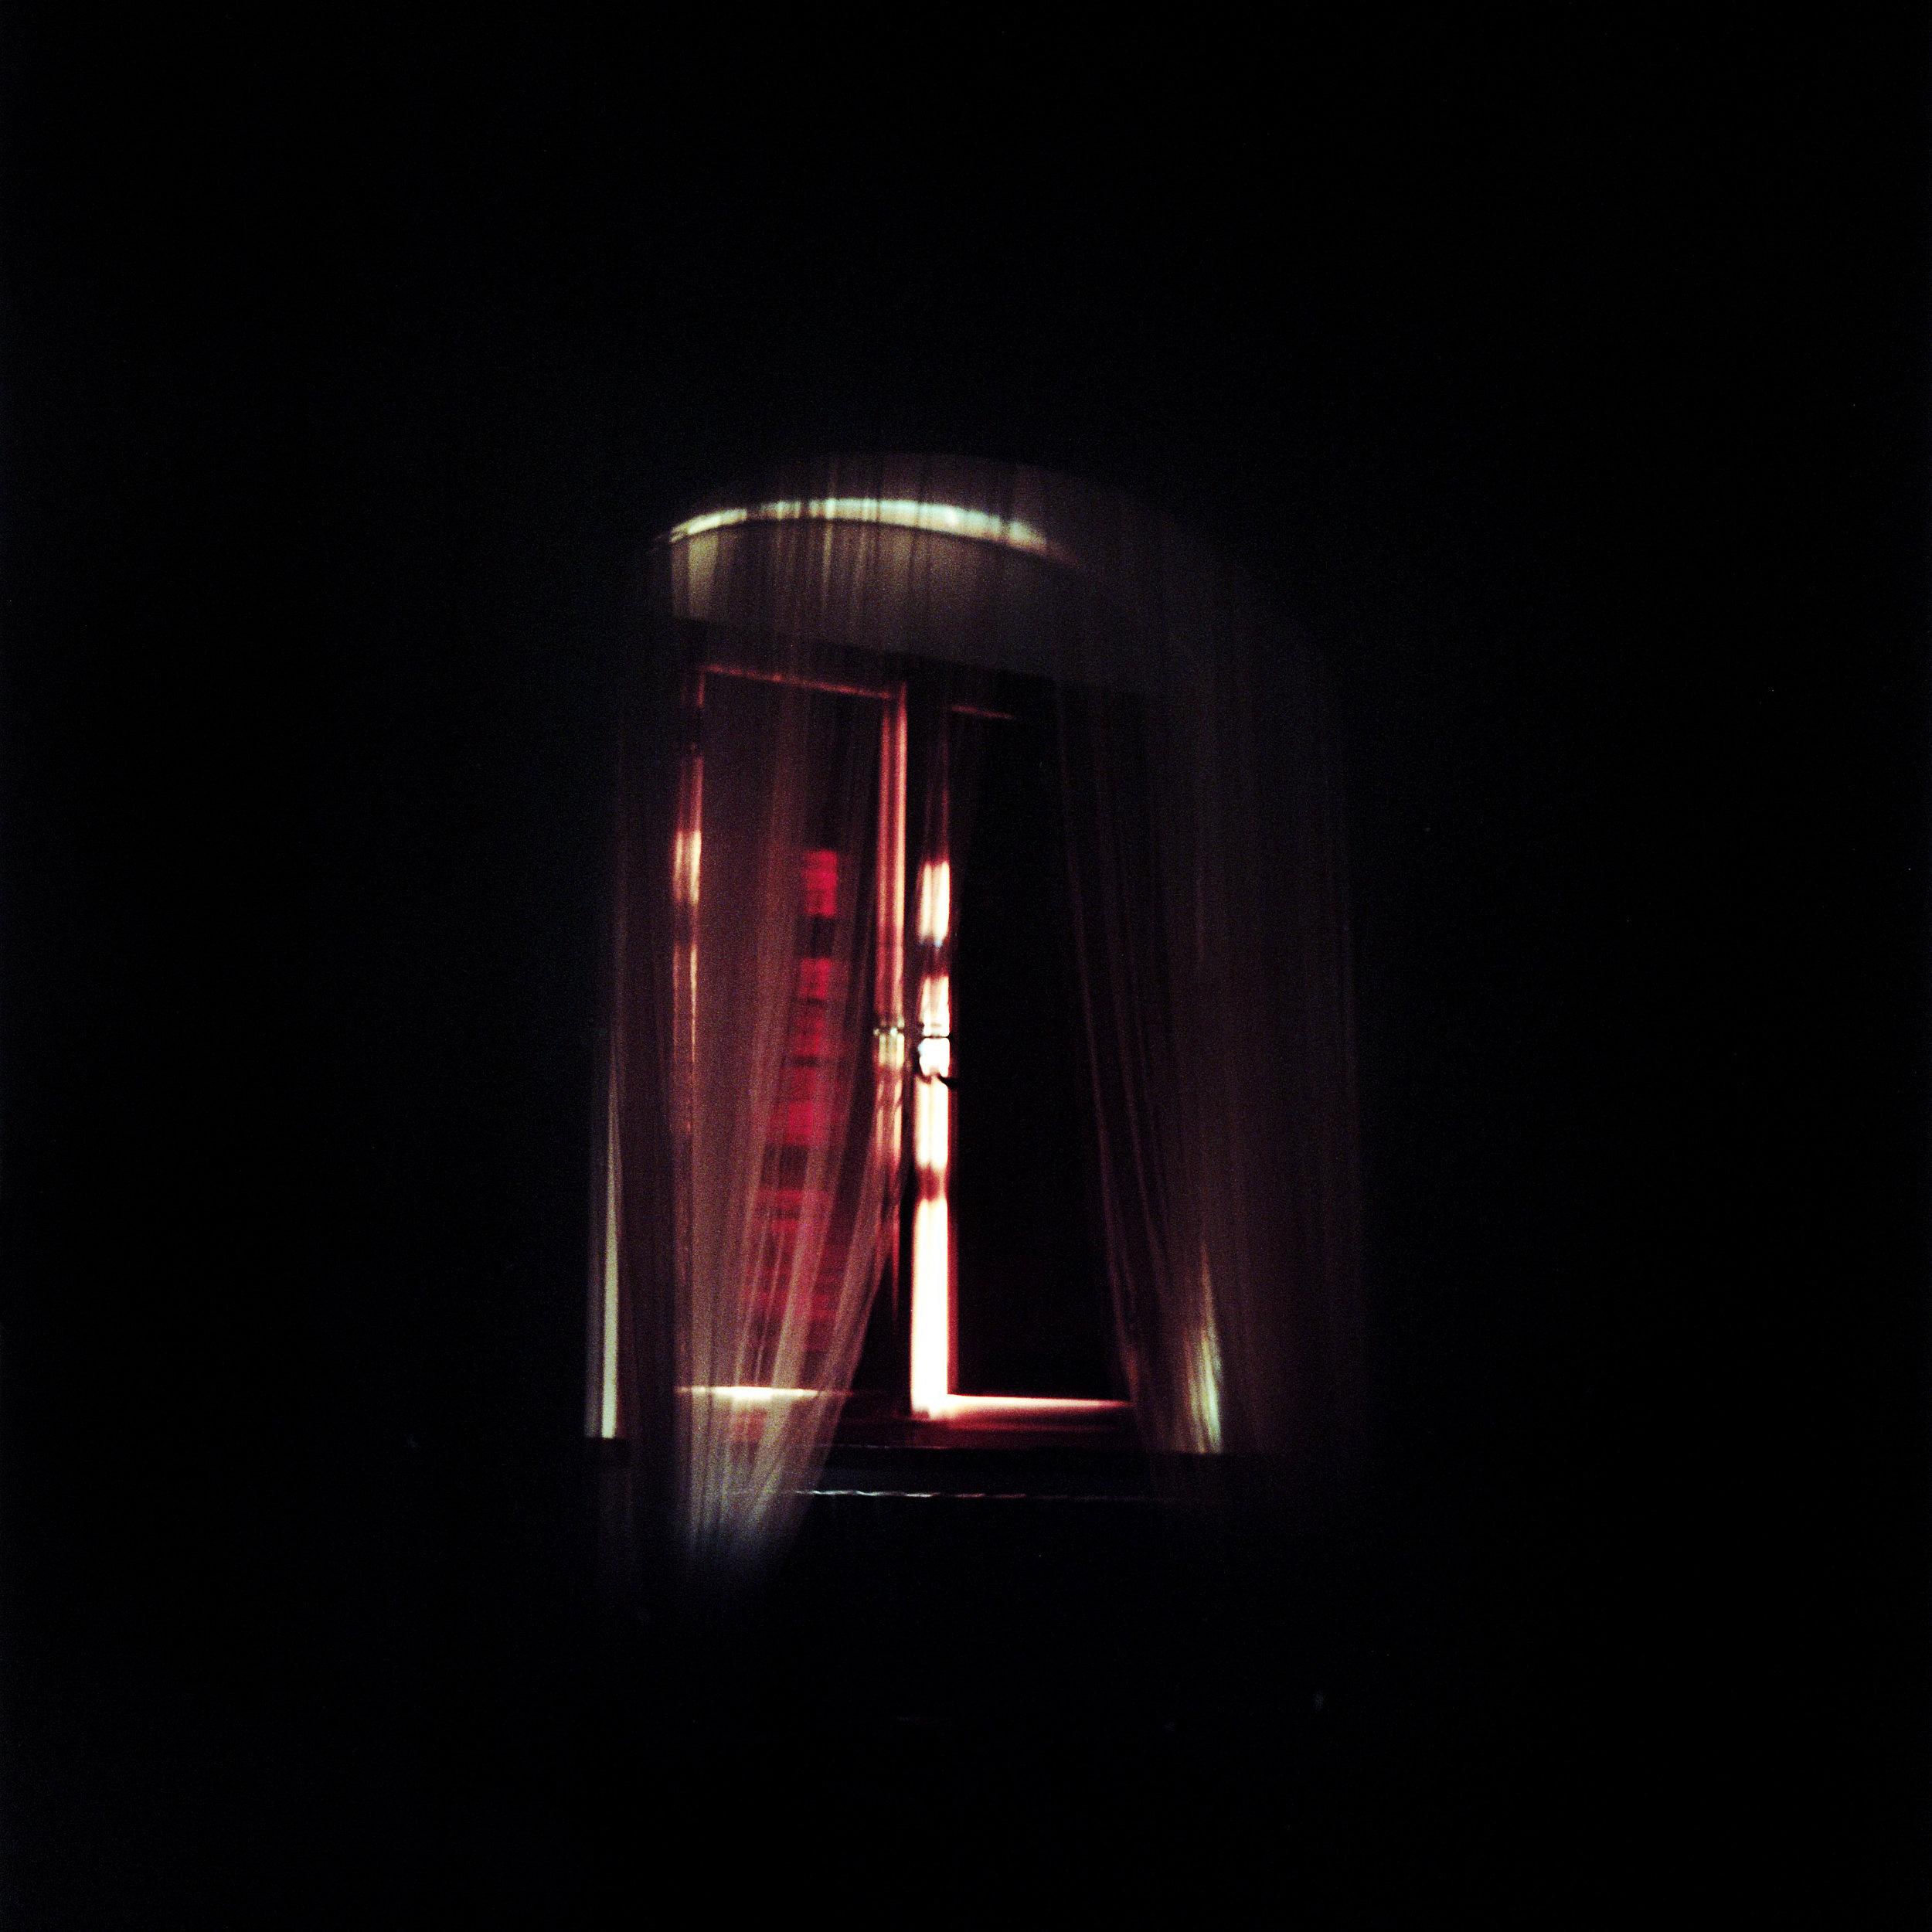 Window, Volterra, Italy